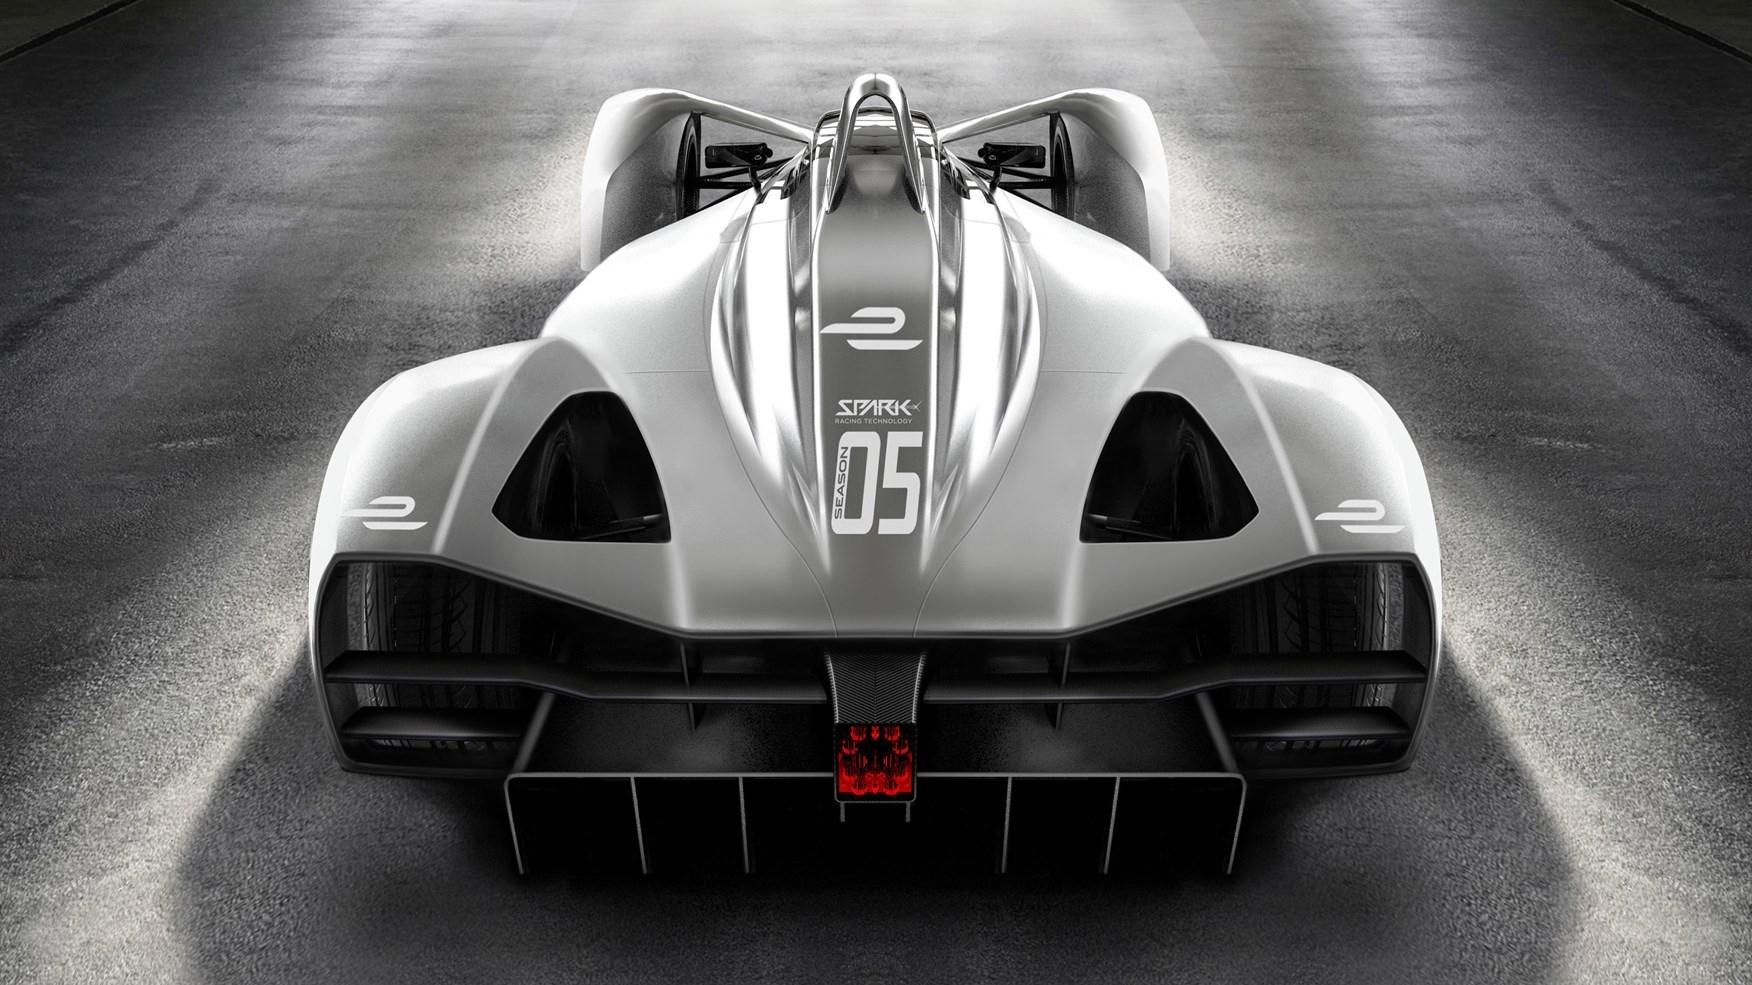 Formula E Gets Radical Redesign And Mclaren Power For 2018 Season in 2020 Formula E Calendar